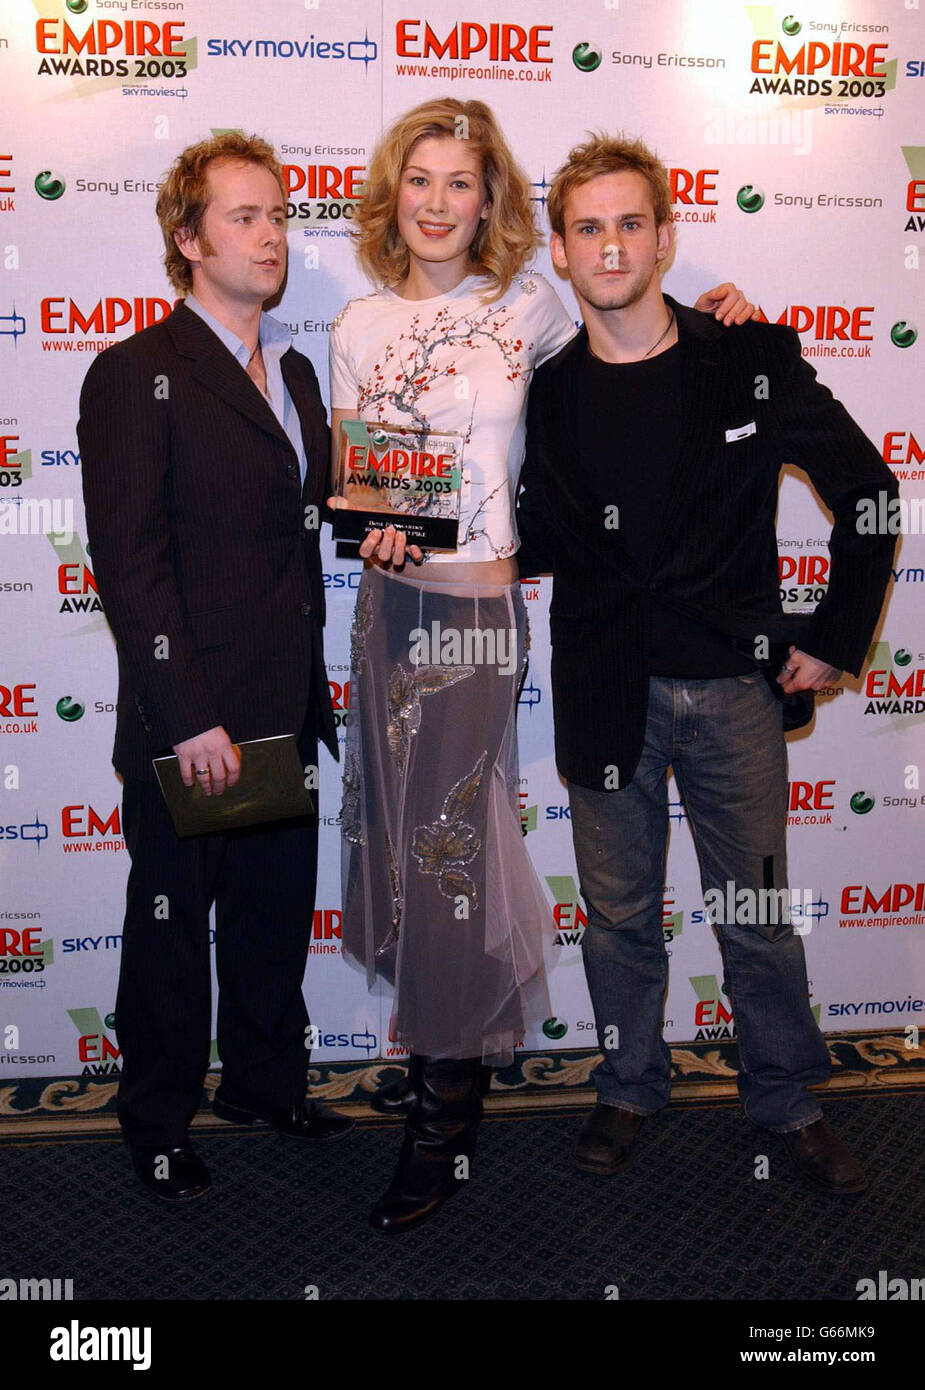 Empire Awards Rosamund Pike - Stock Image